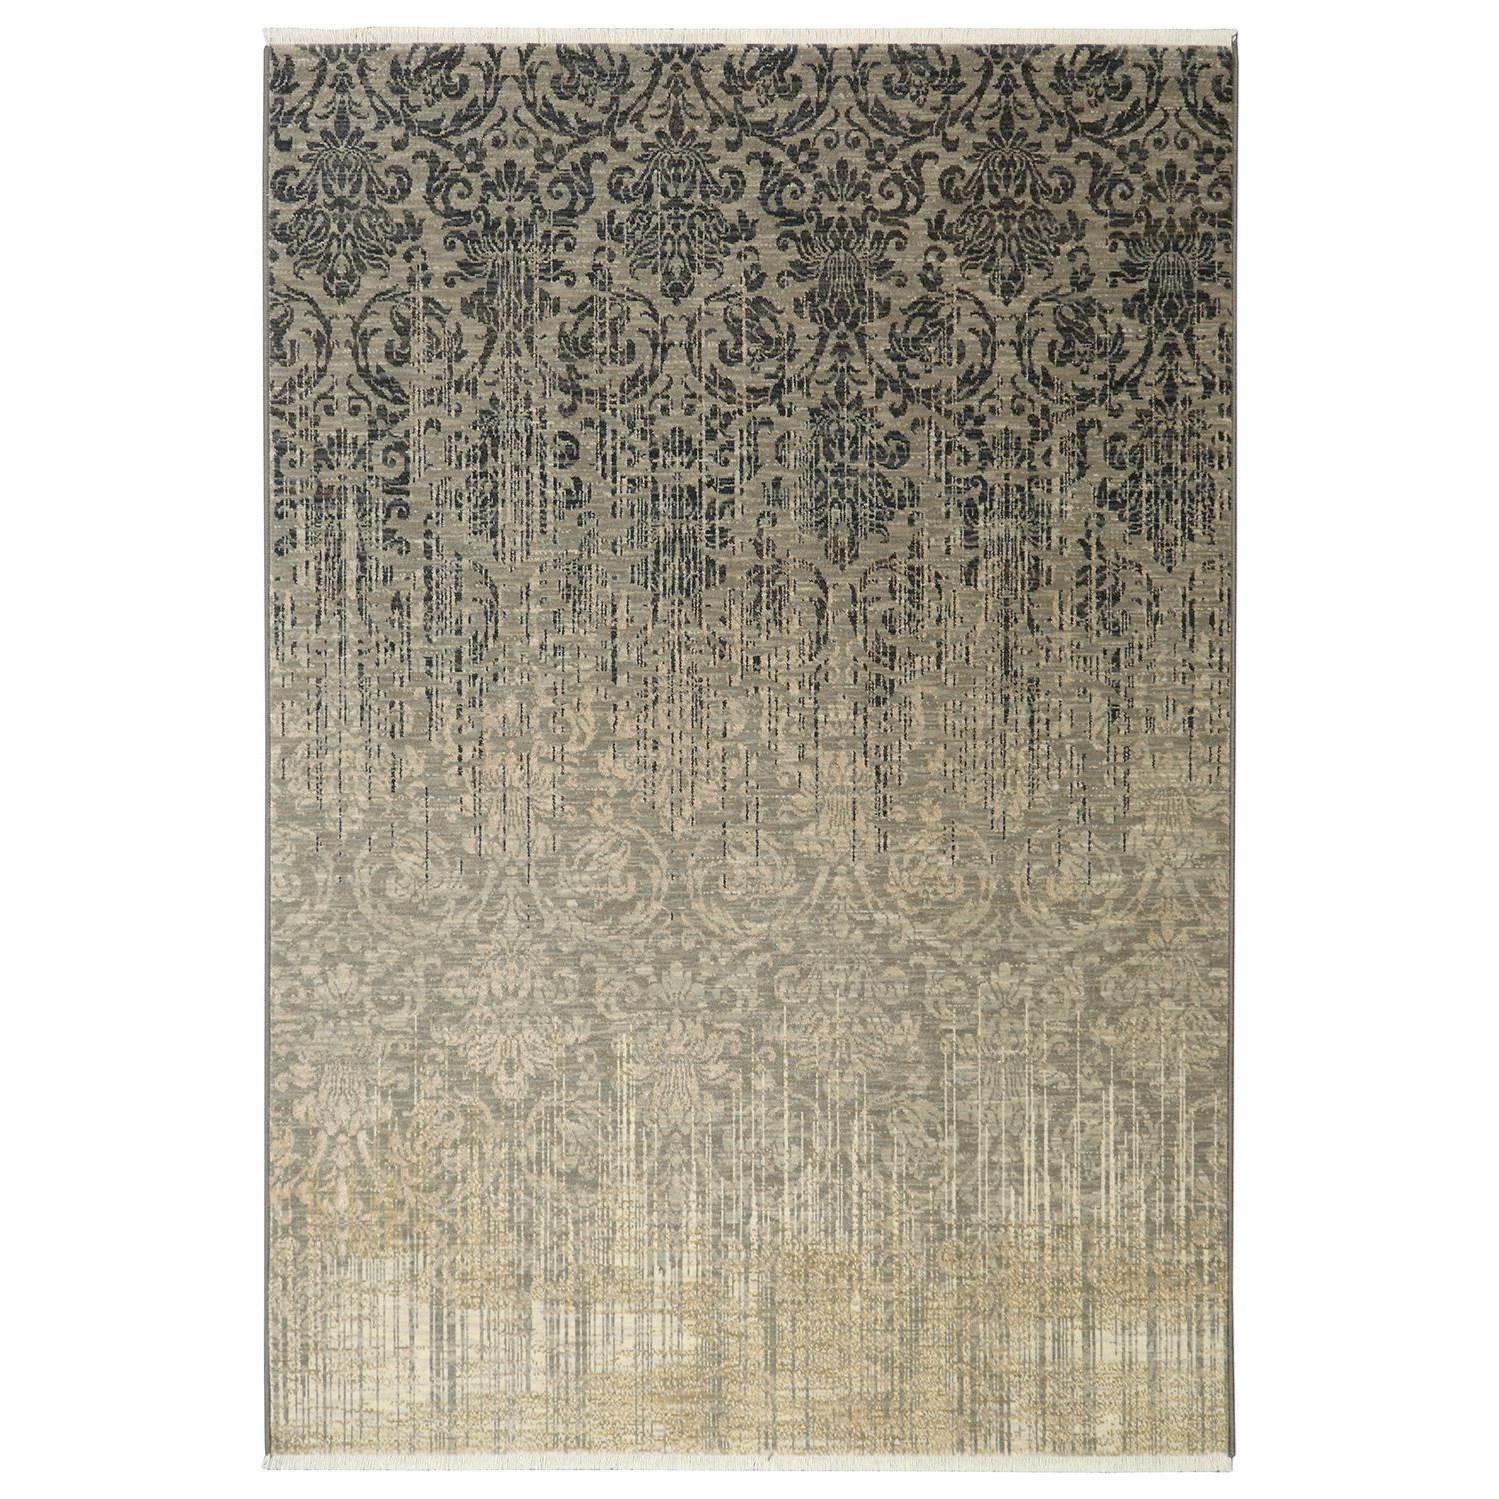 Titanium 3'6x5'6 Tiberio Gray Rug by Karastan Rugs at Darvin Furniture